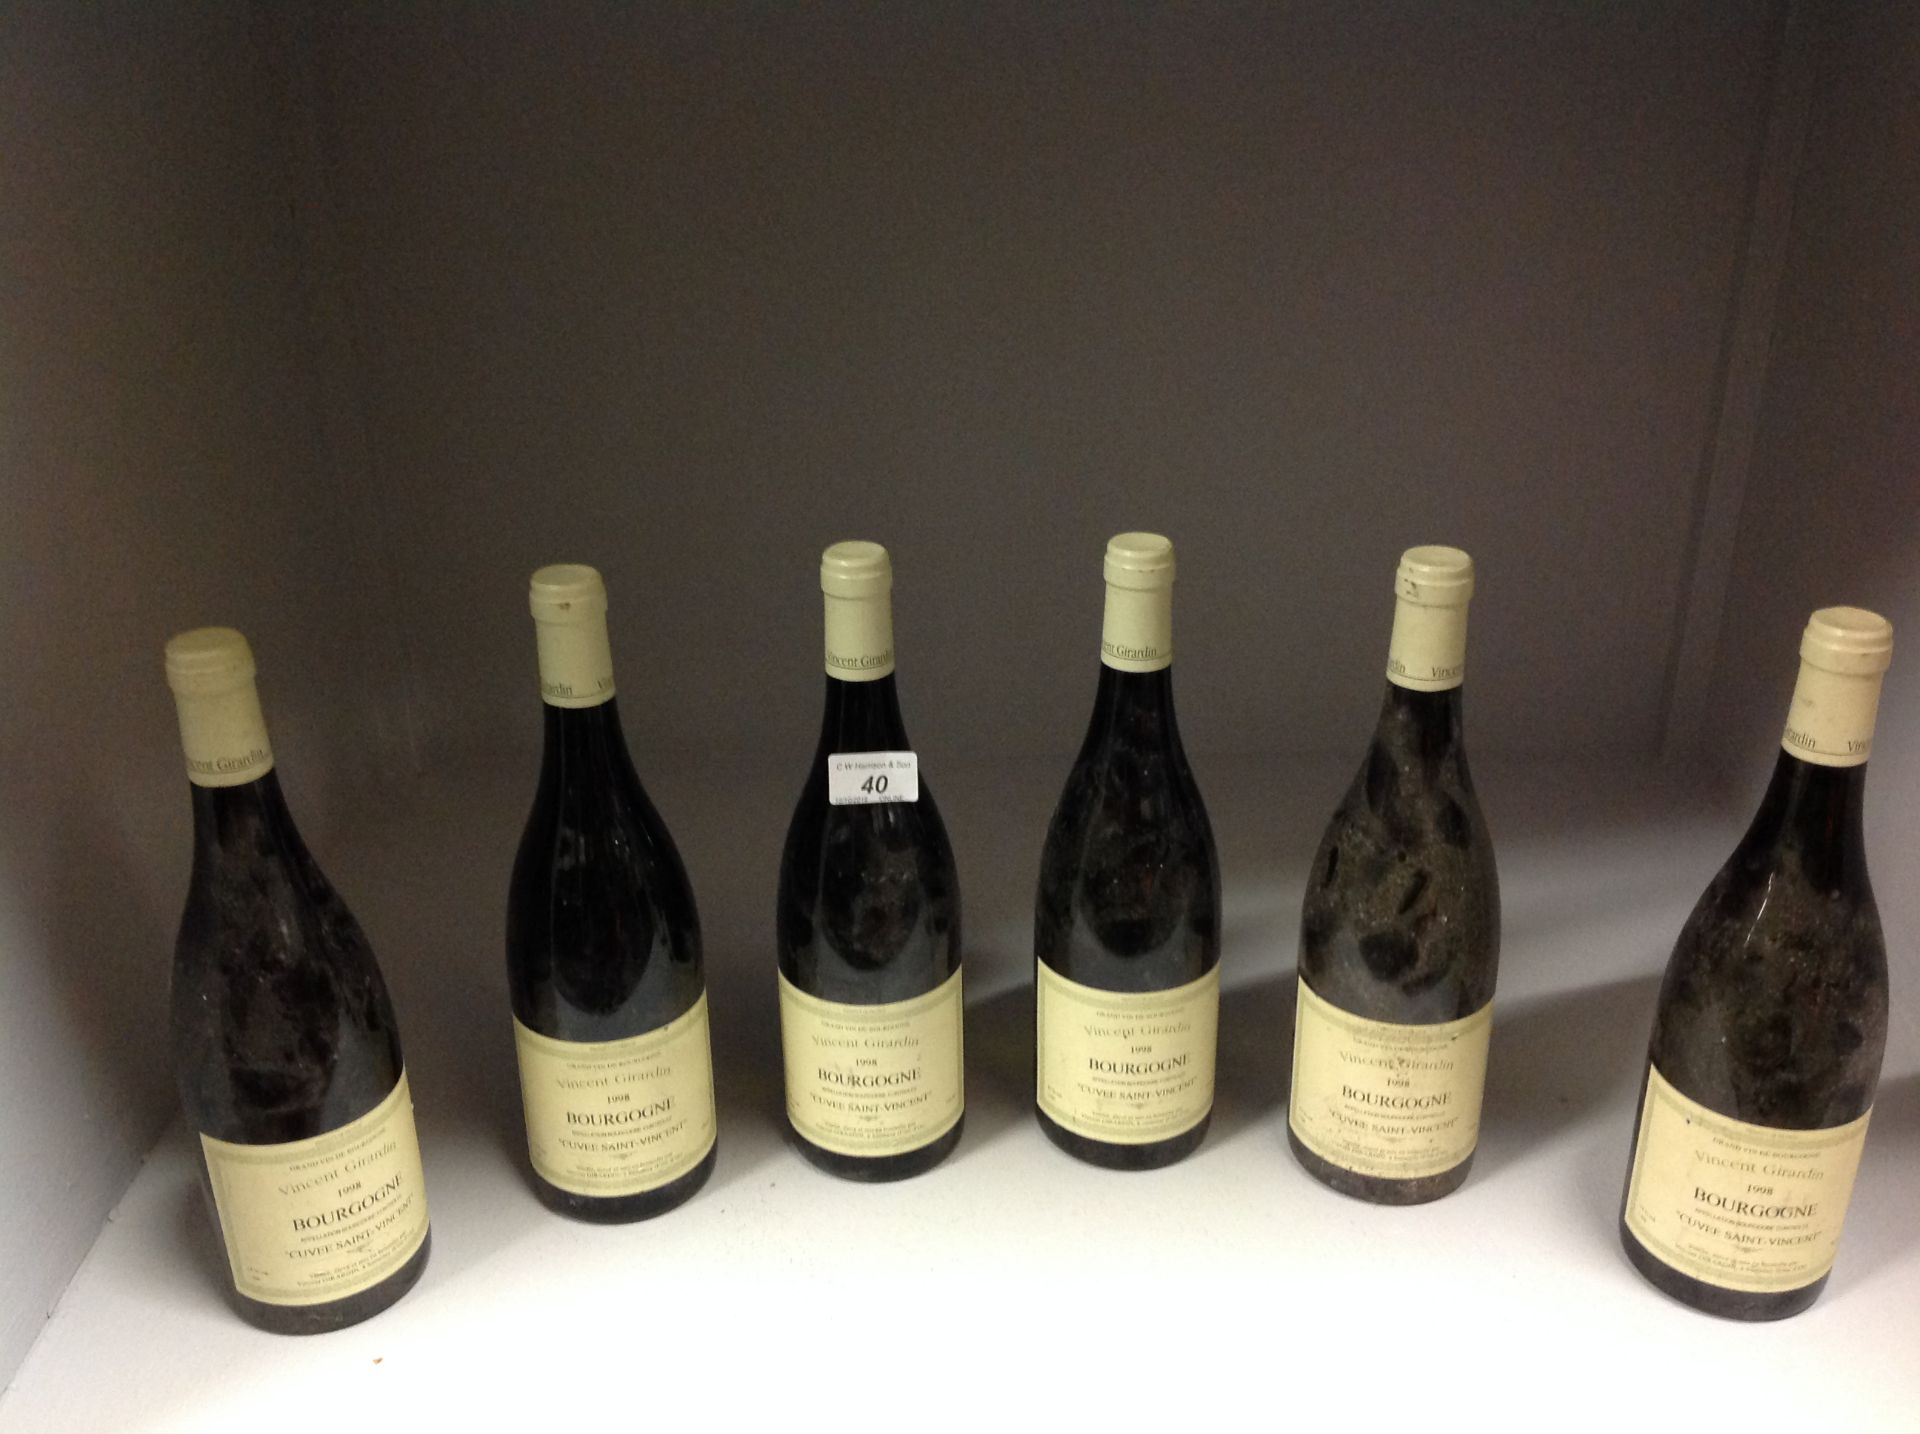 Lot 40 - 6 x 750ml bottles Vincent Girardin 1998